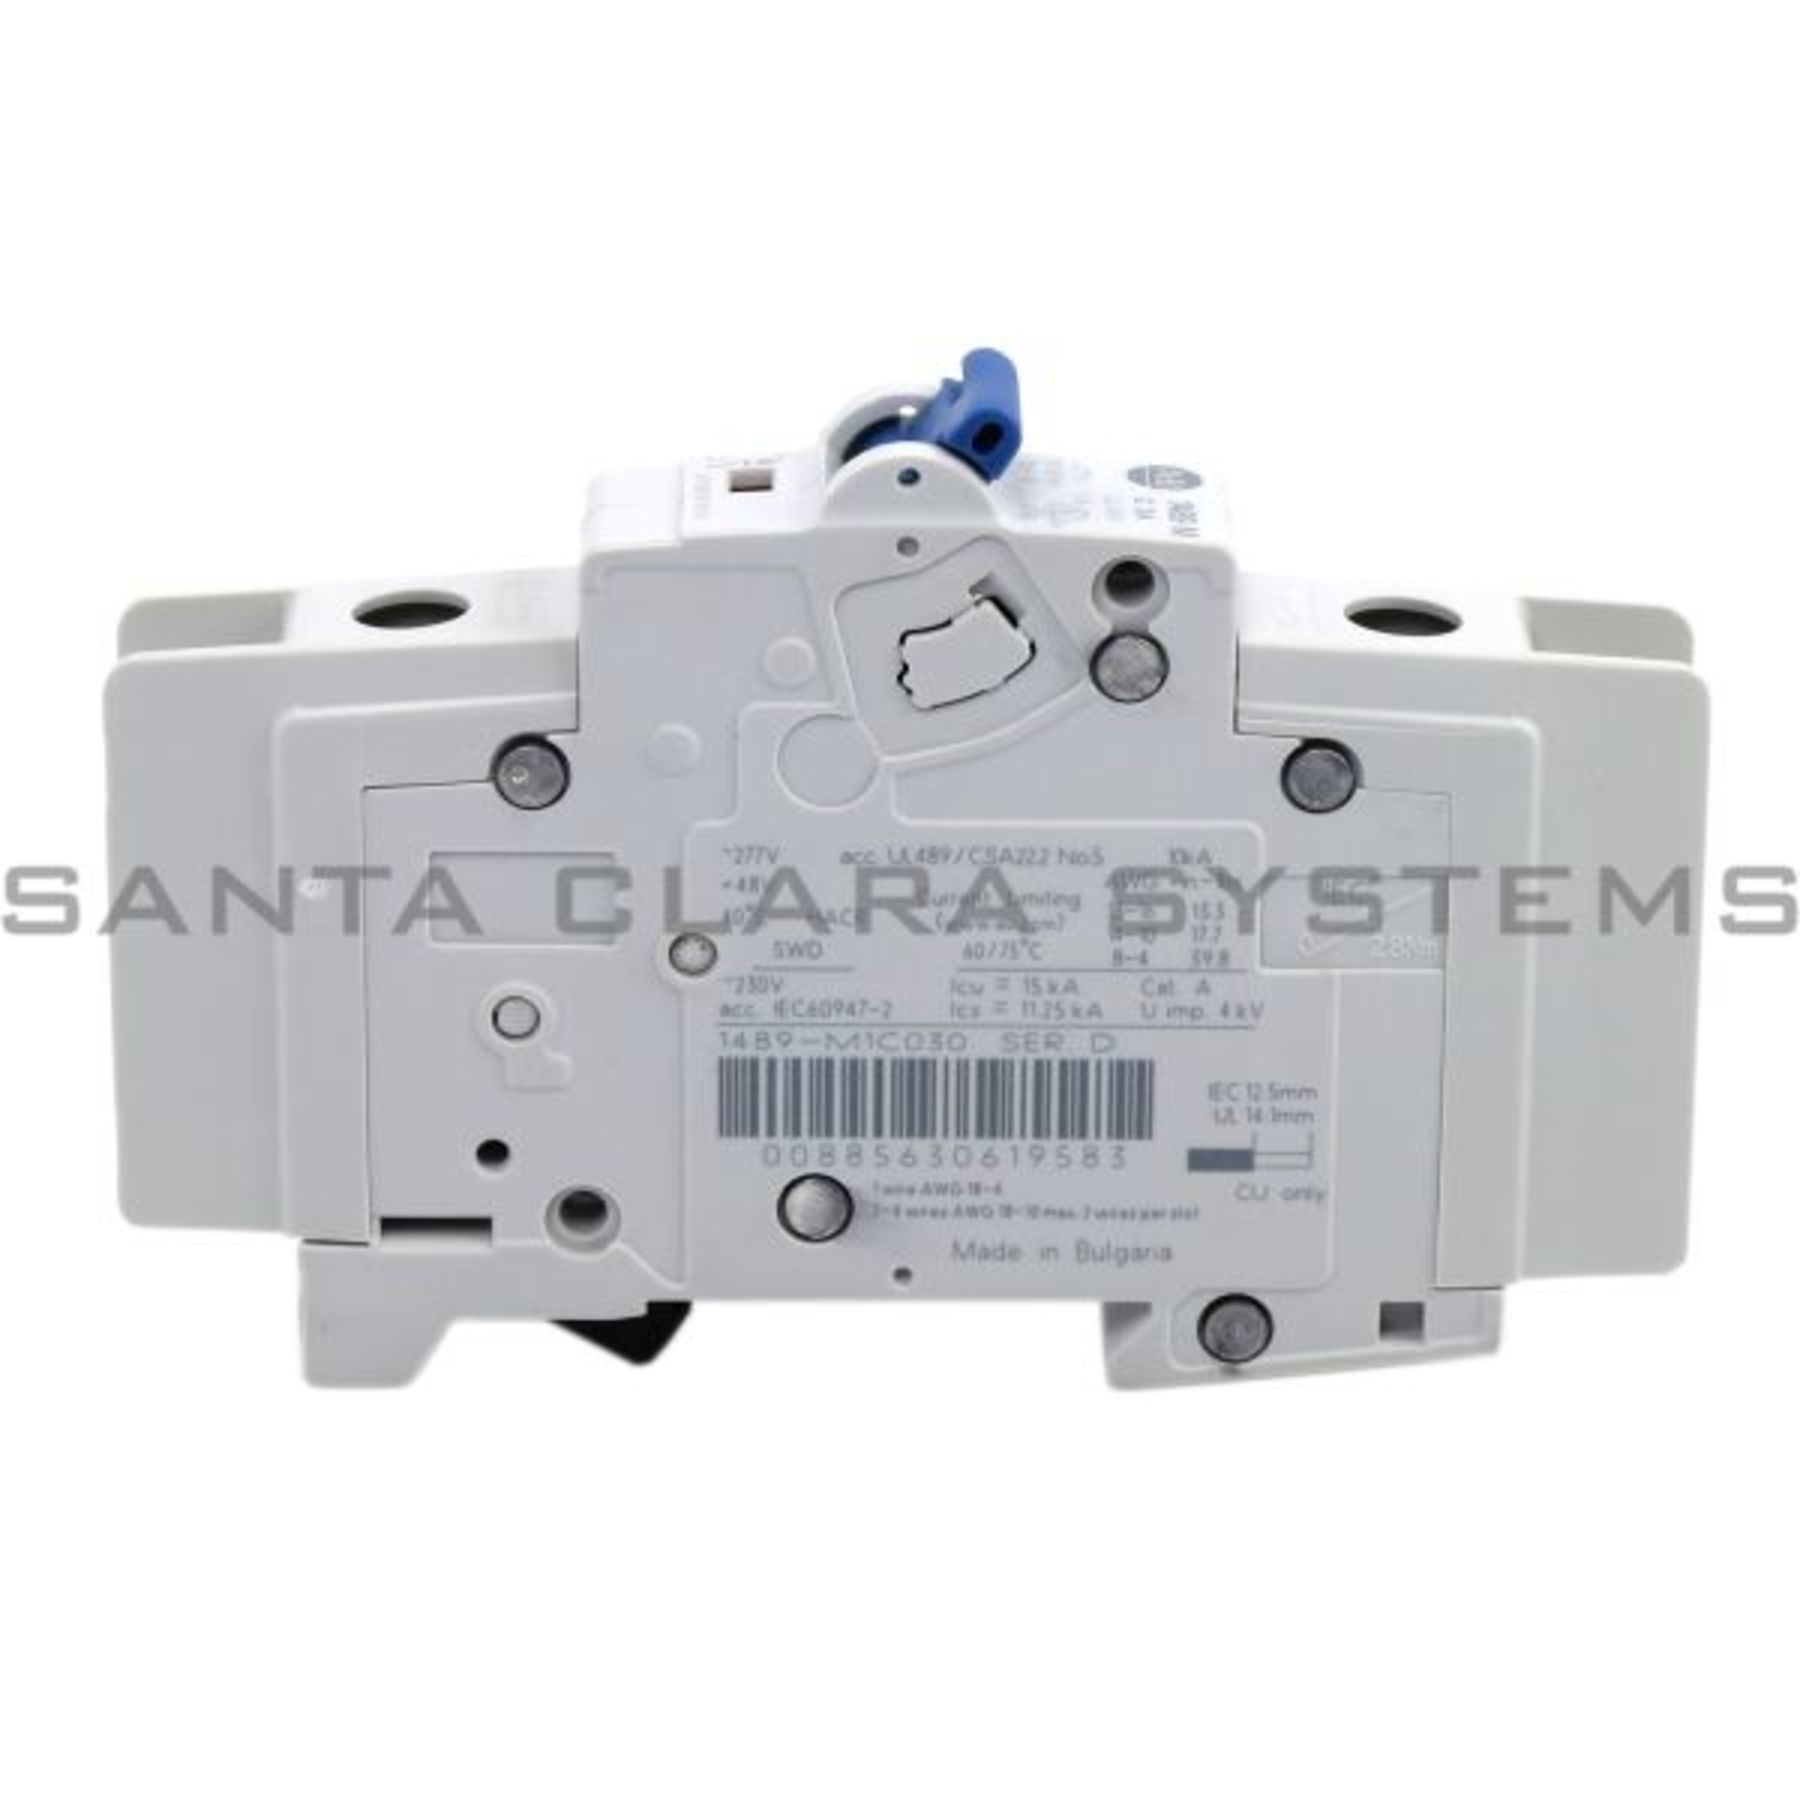 Allen Bradley 1489-M1C030 Miniature Circuit Breaker Product Image